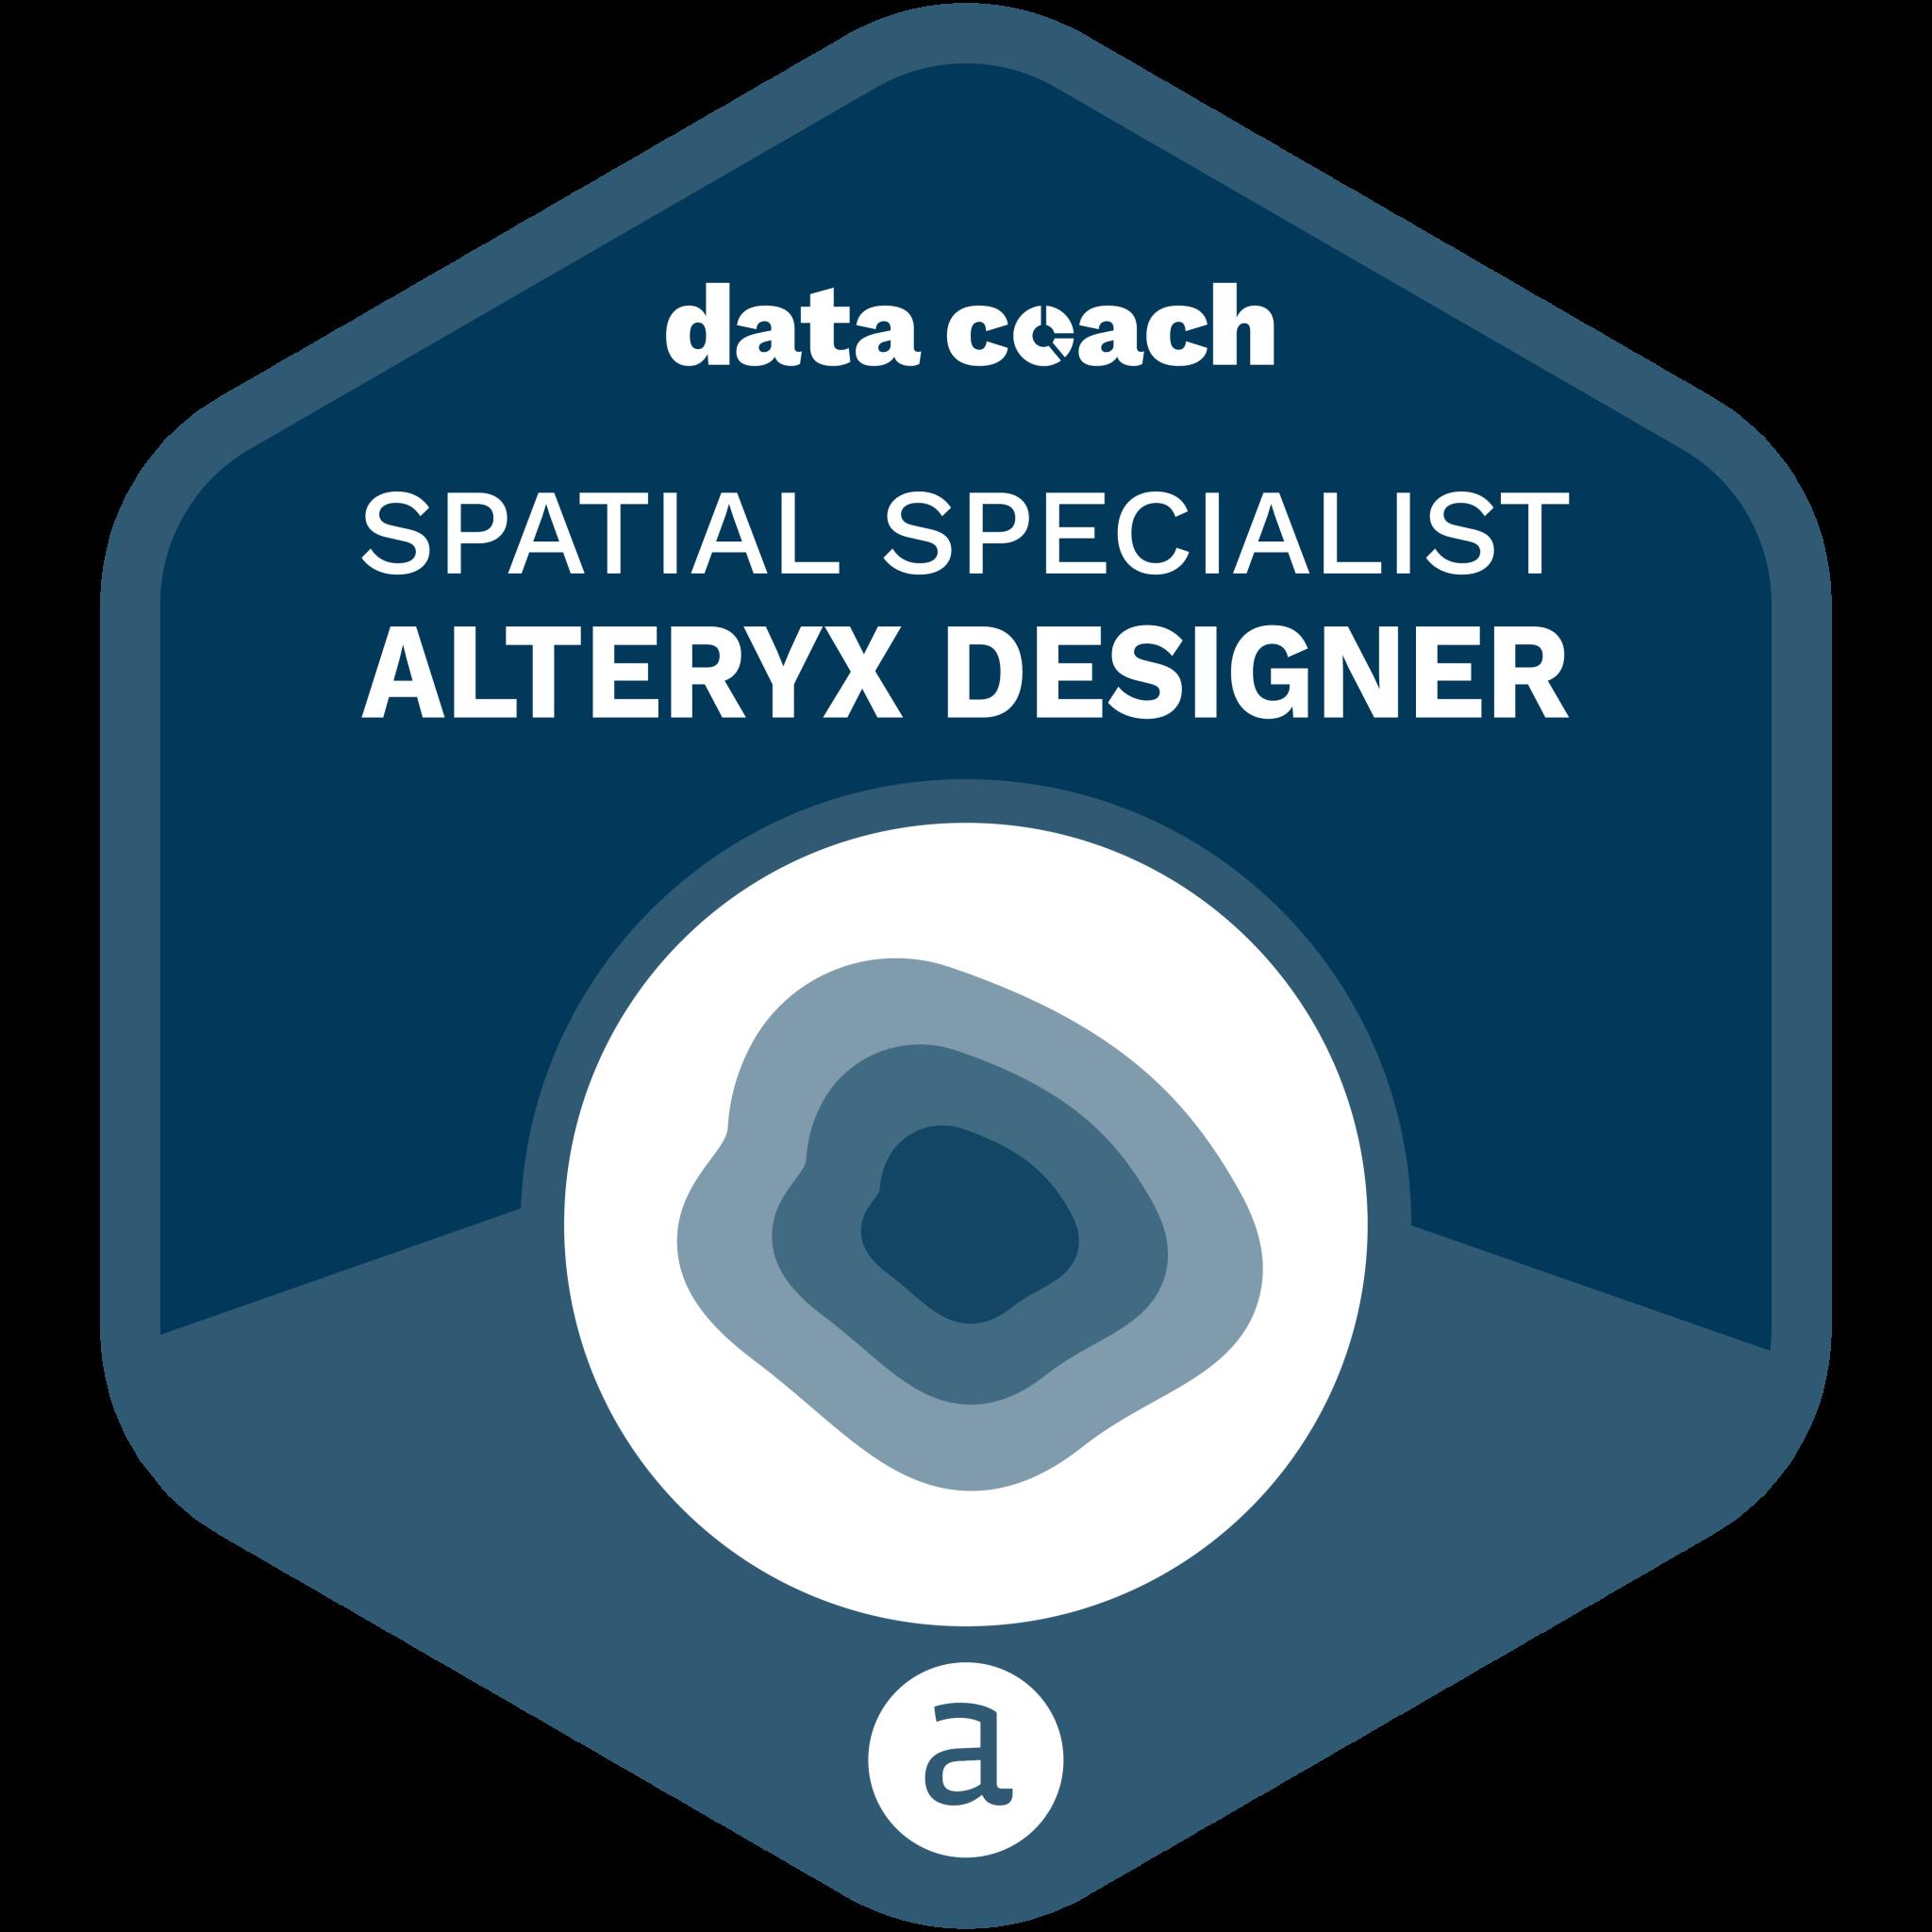 Alteryx-Designer-Spatial-Specialist